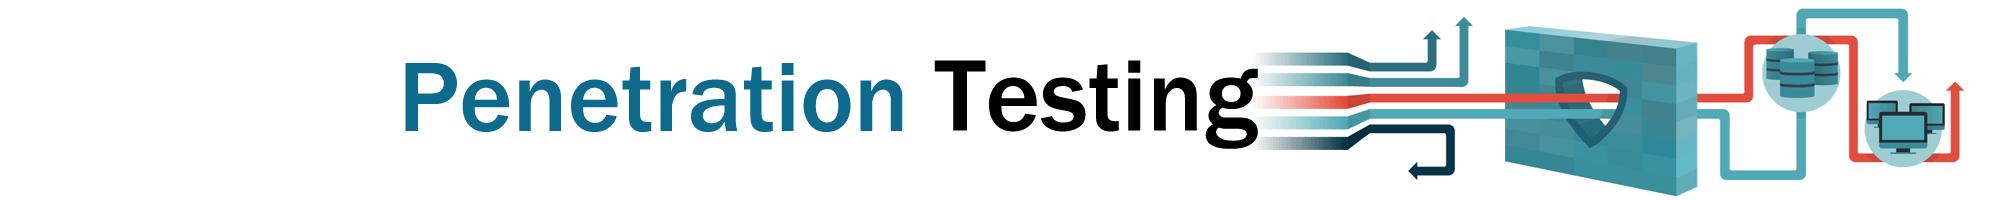 Penetration Testing in RI